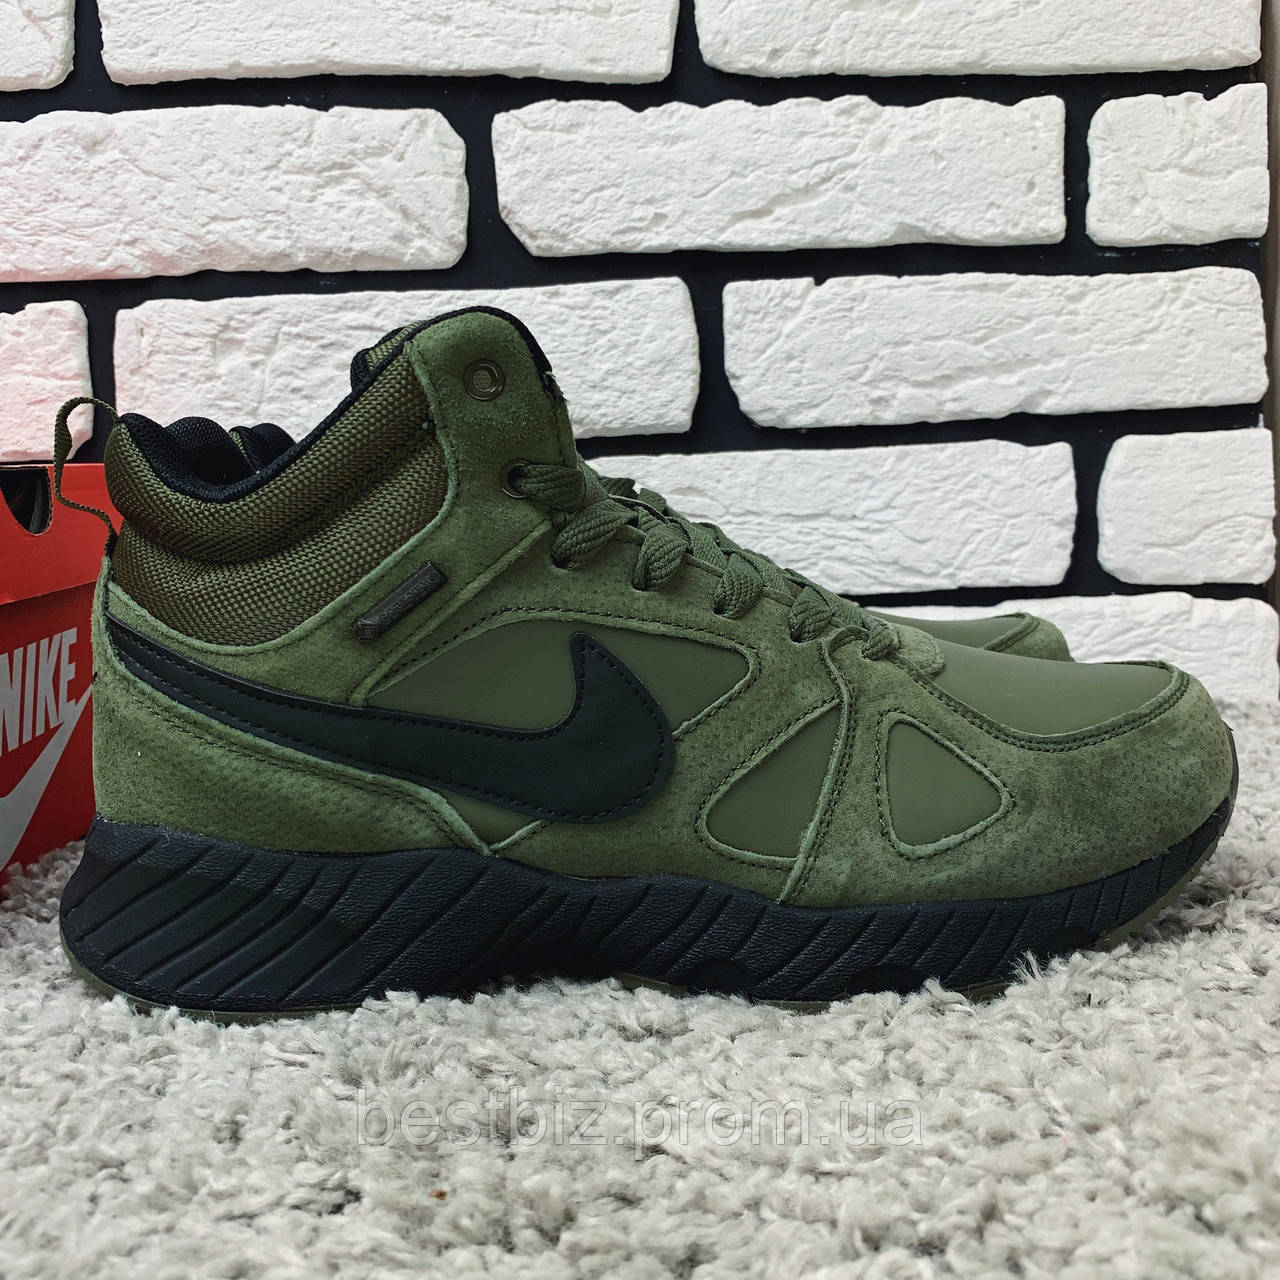 Зимние ботинки (на меху) Nike Air Max 1-020 ⏩ [ 45 последний размер ]